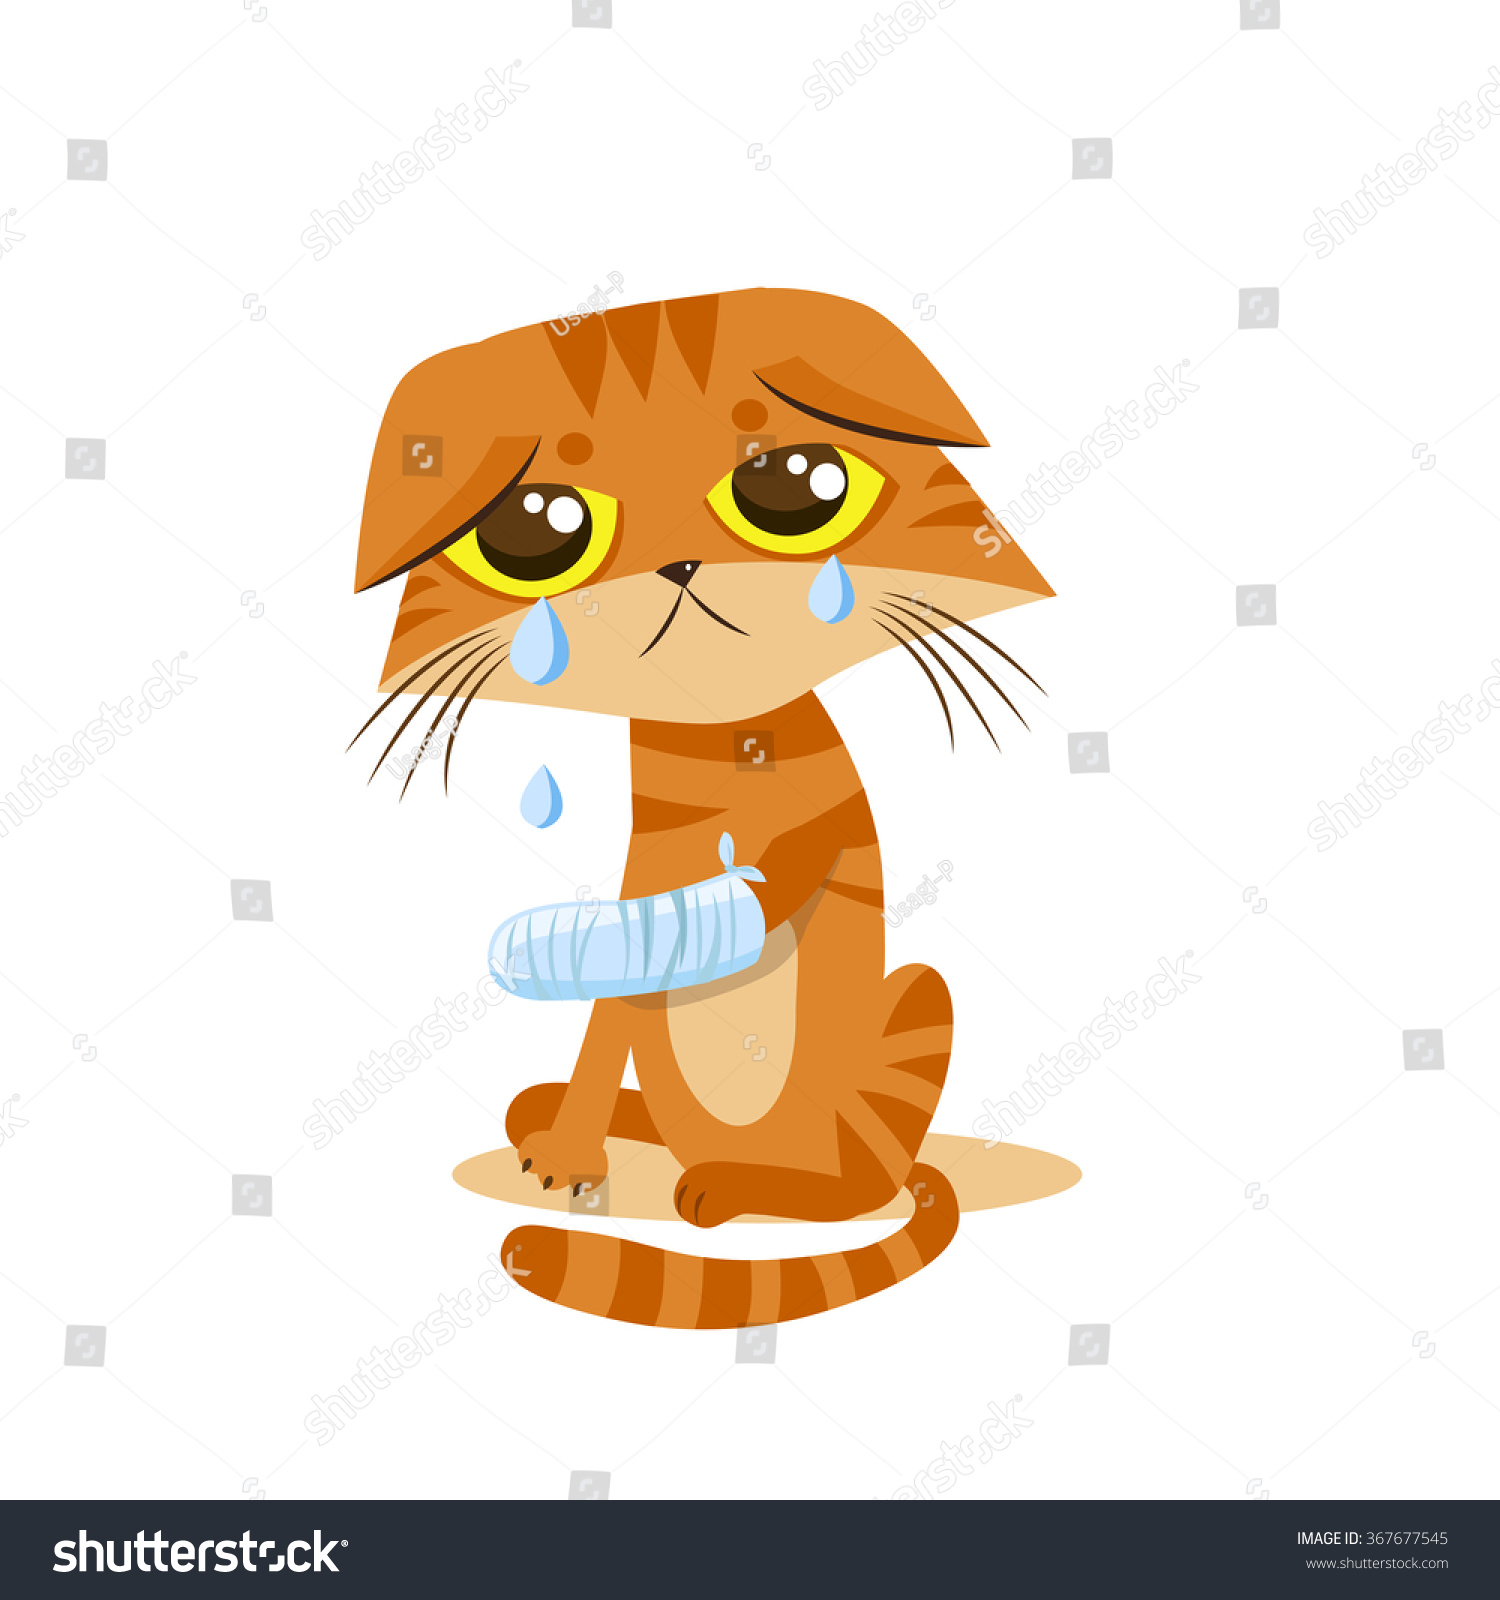 Sad Crying Cat. Cartoon vector illustration. Crying cat meme. Cat face ...